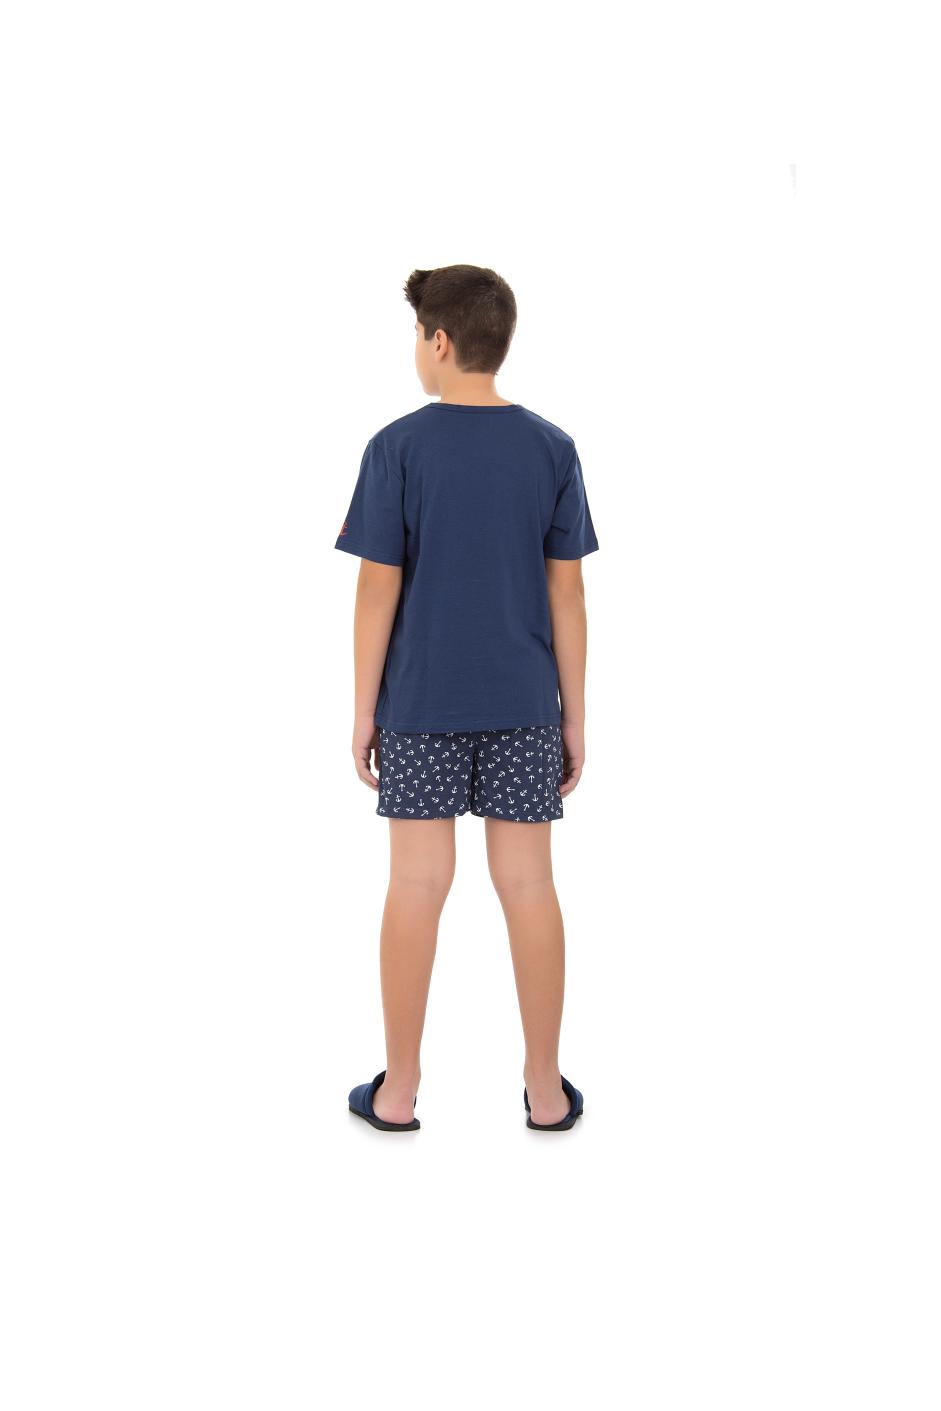 Pijama Masculino Curto Juvenil